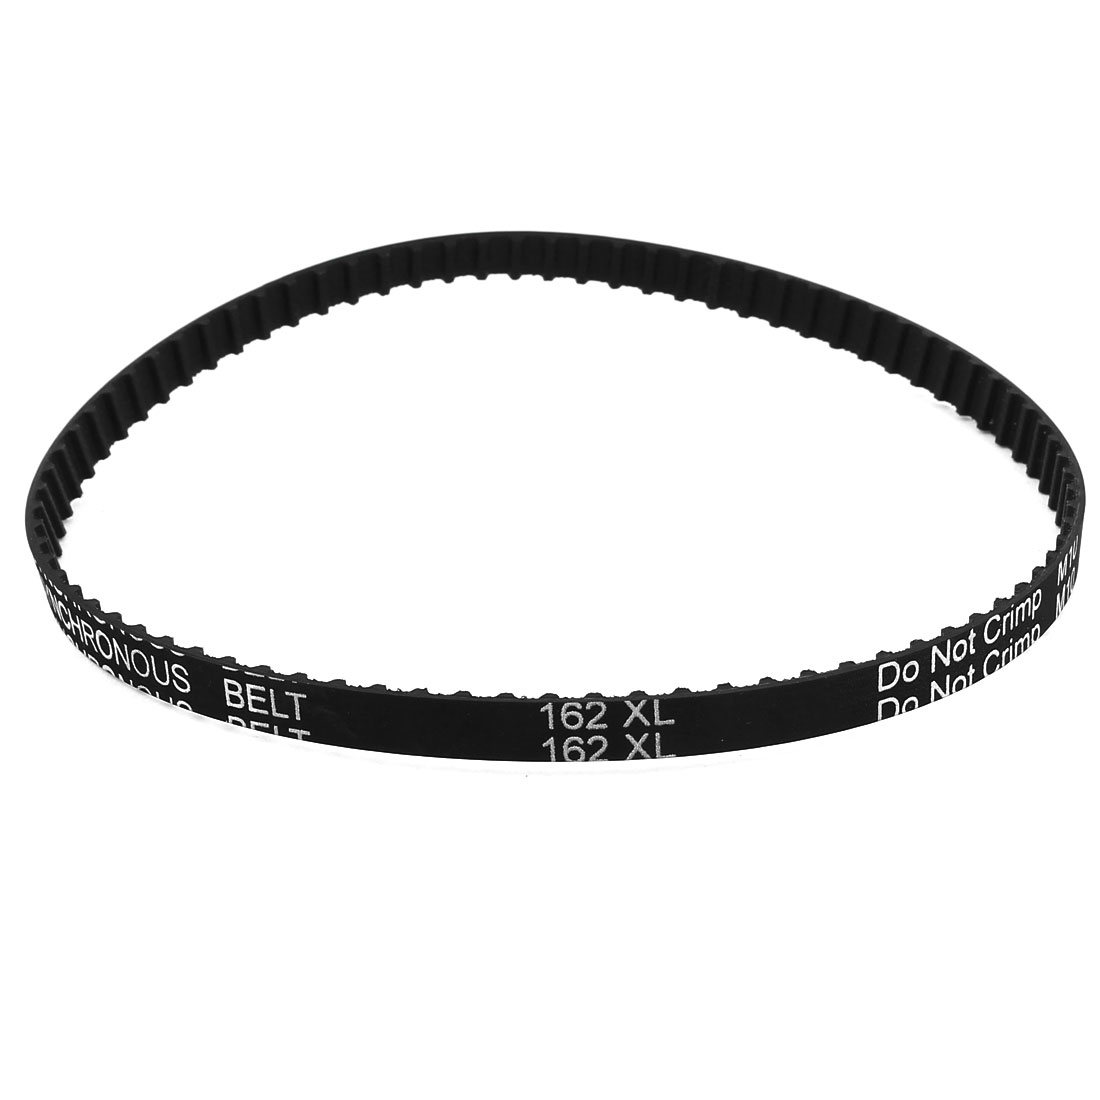 162XL 031 81 Teeth 7.9mm Width Rubber Drying Machine Timing Belt Black